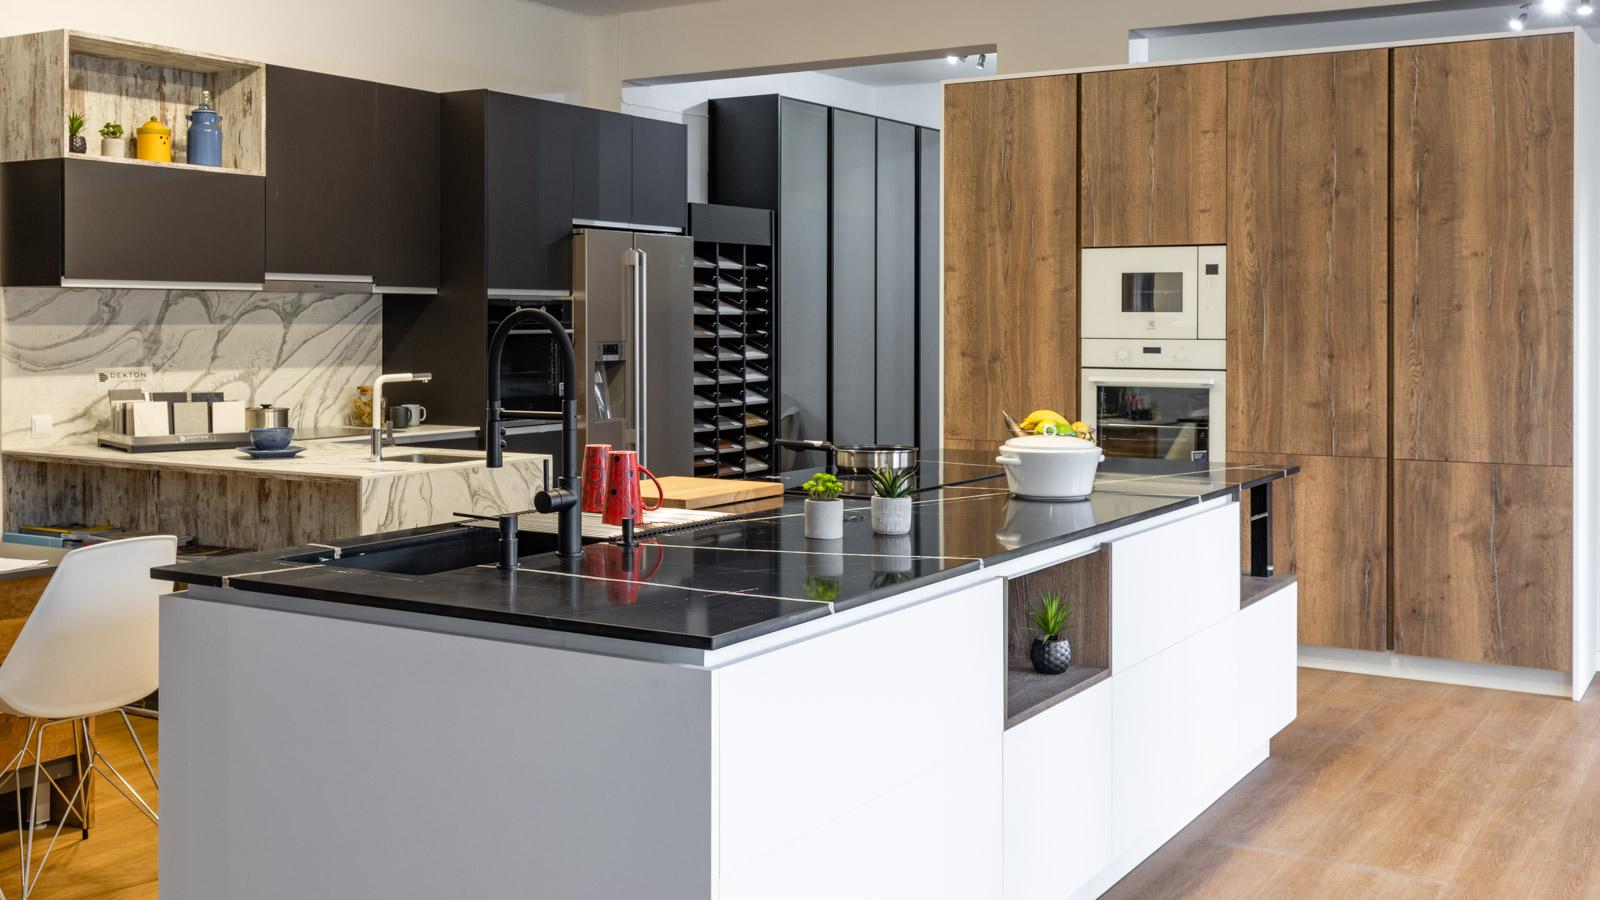 Kitchen Showroom JMQ Cozinhas in Armação de Pêra